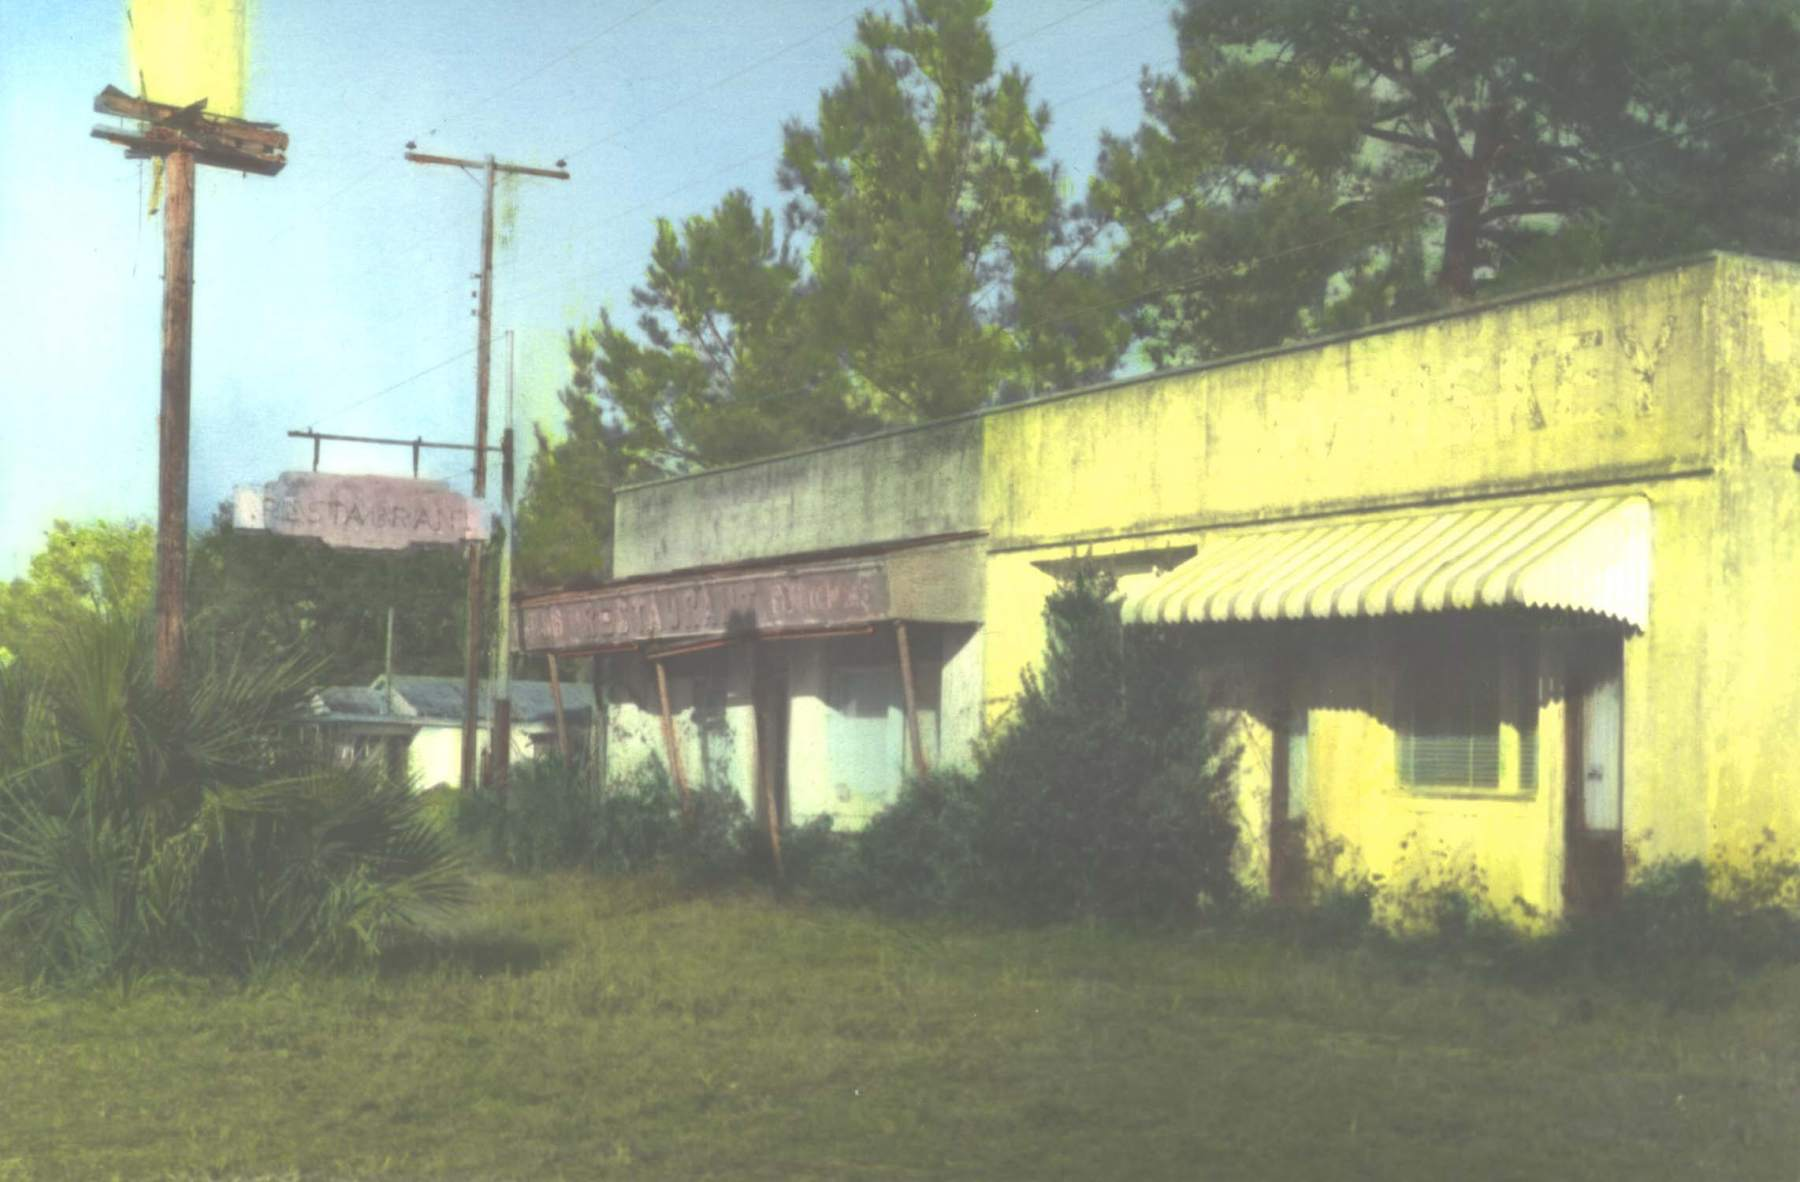 Abondoned town, N. Florida